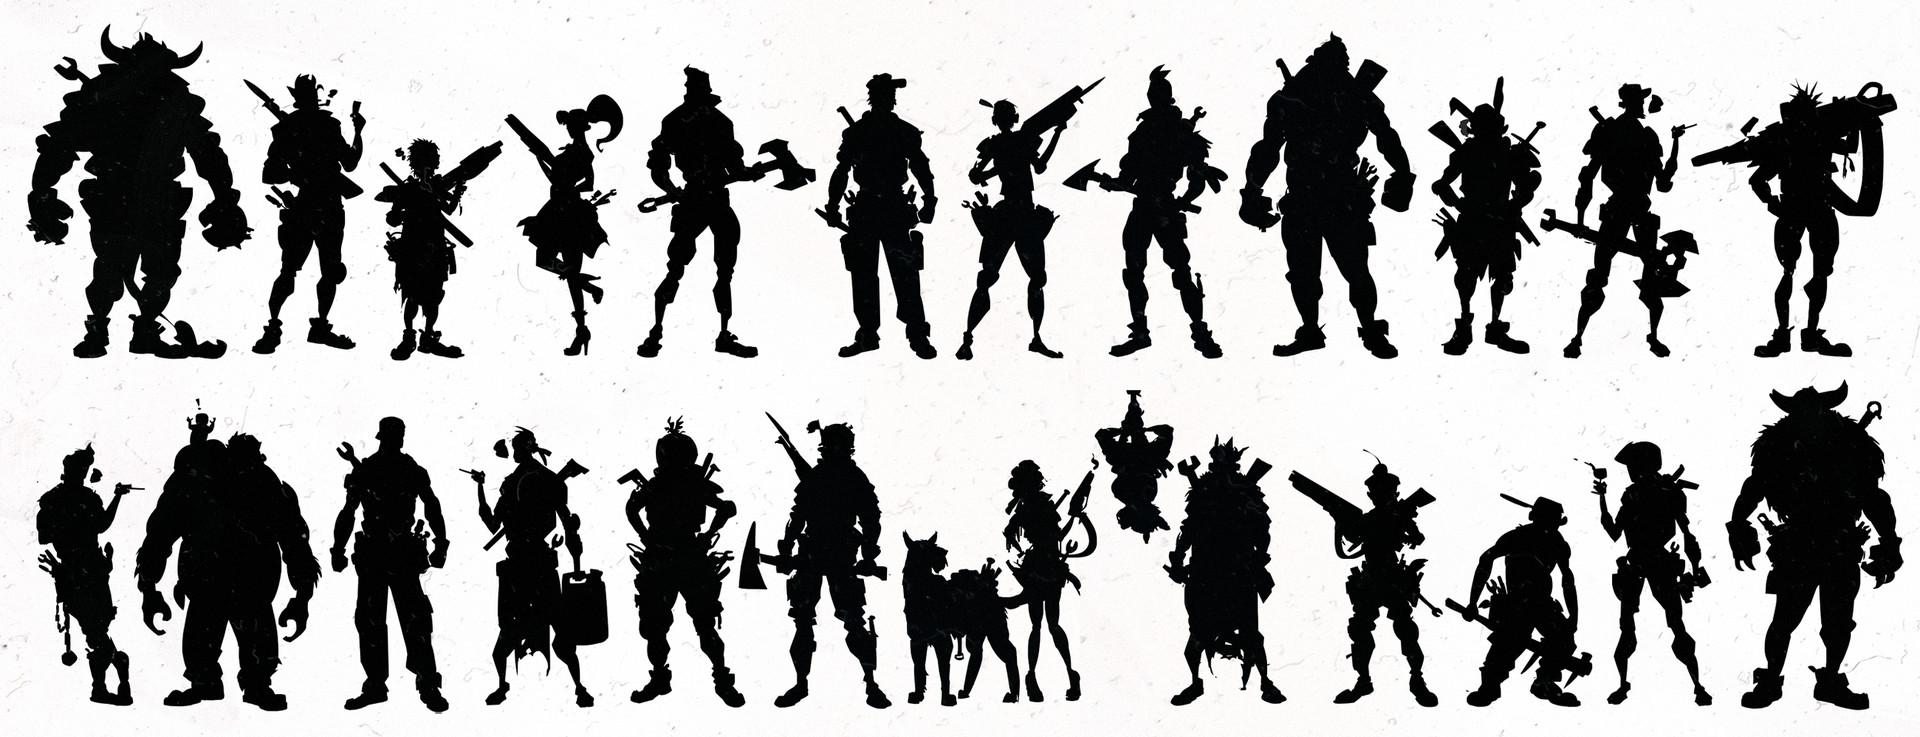 Scott flanders grip silhouettes 1